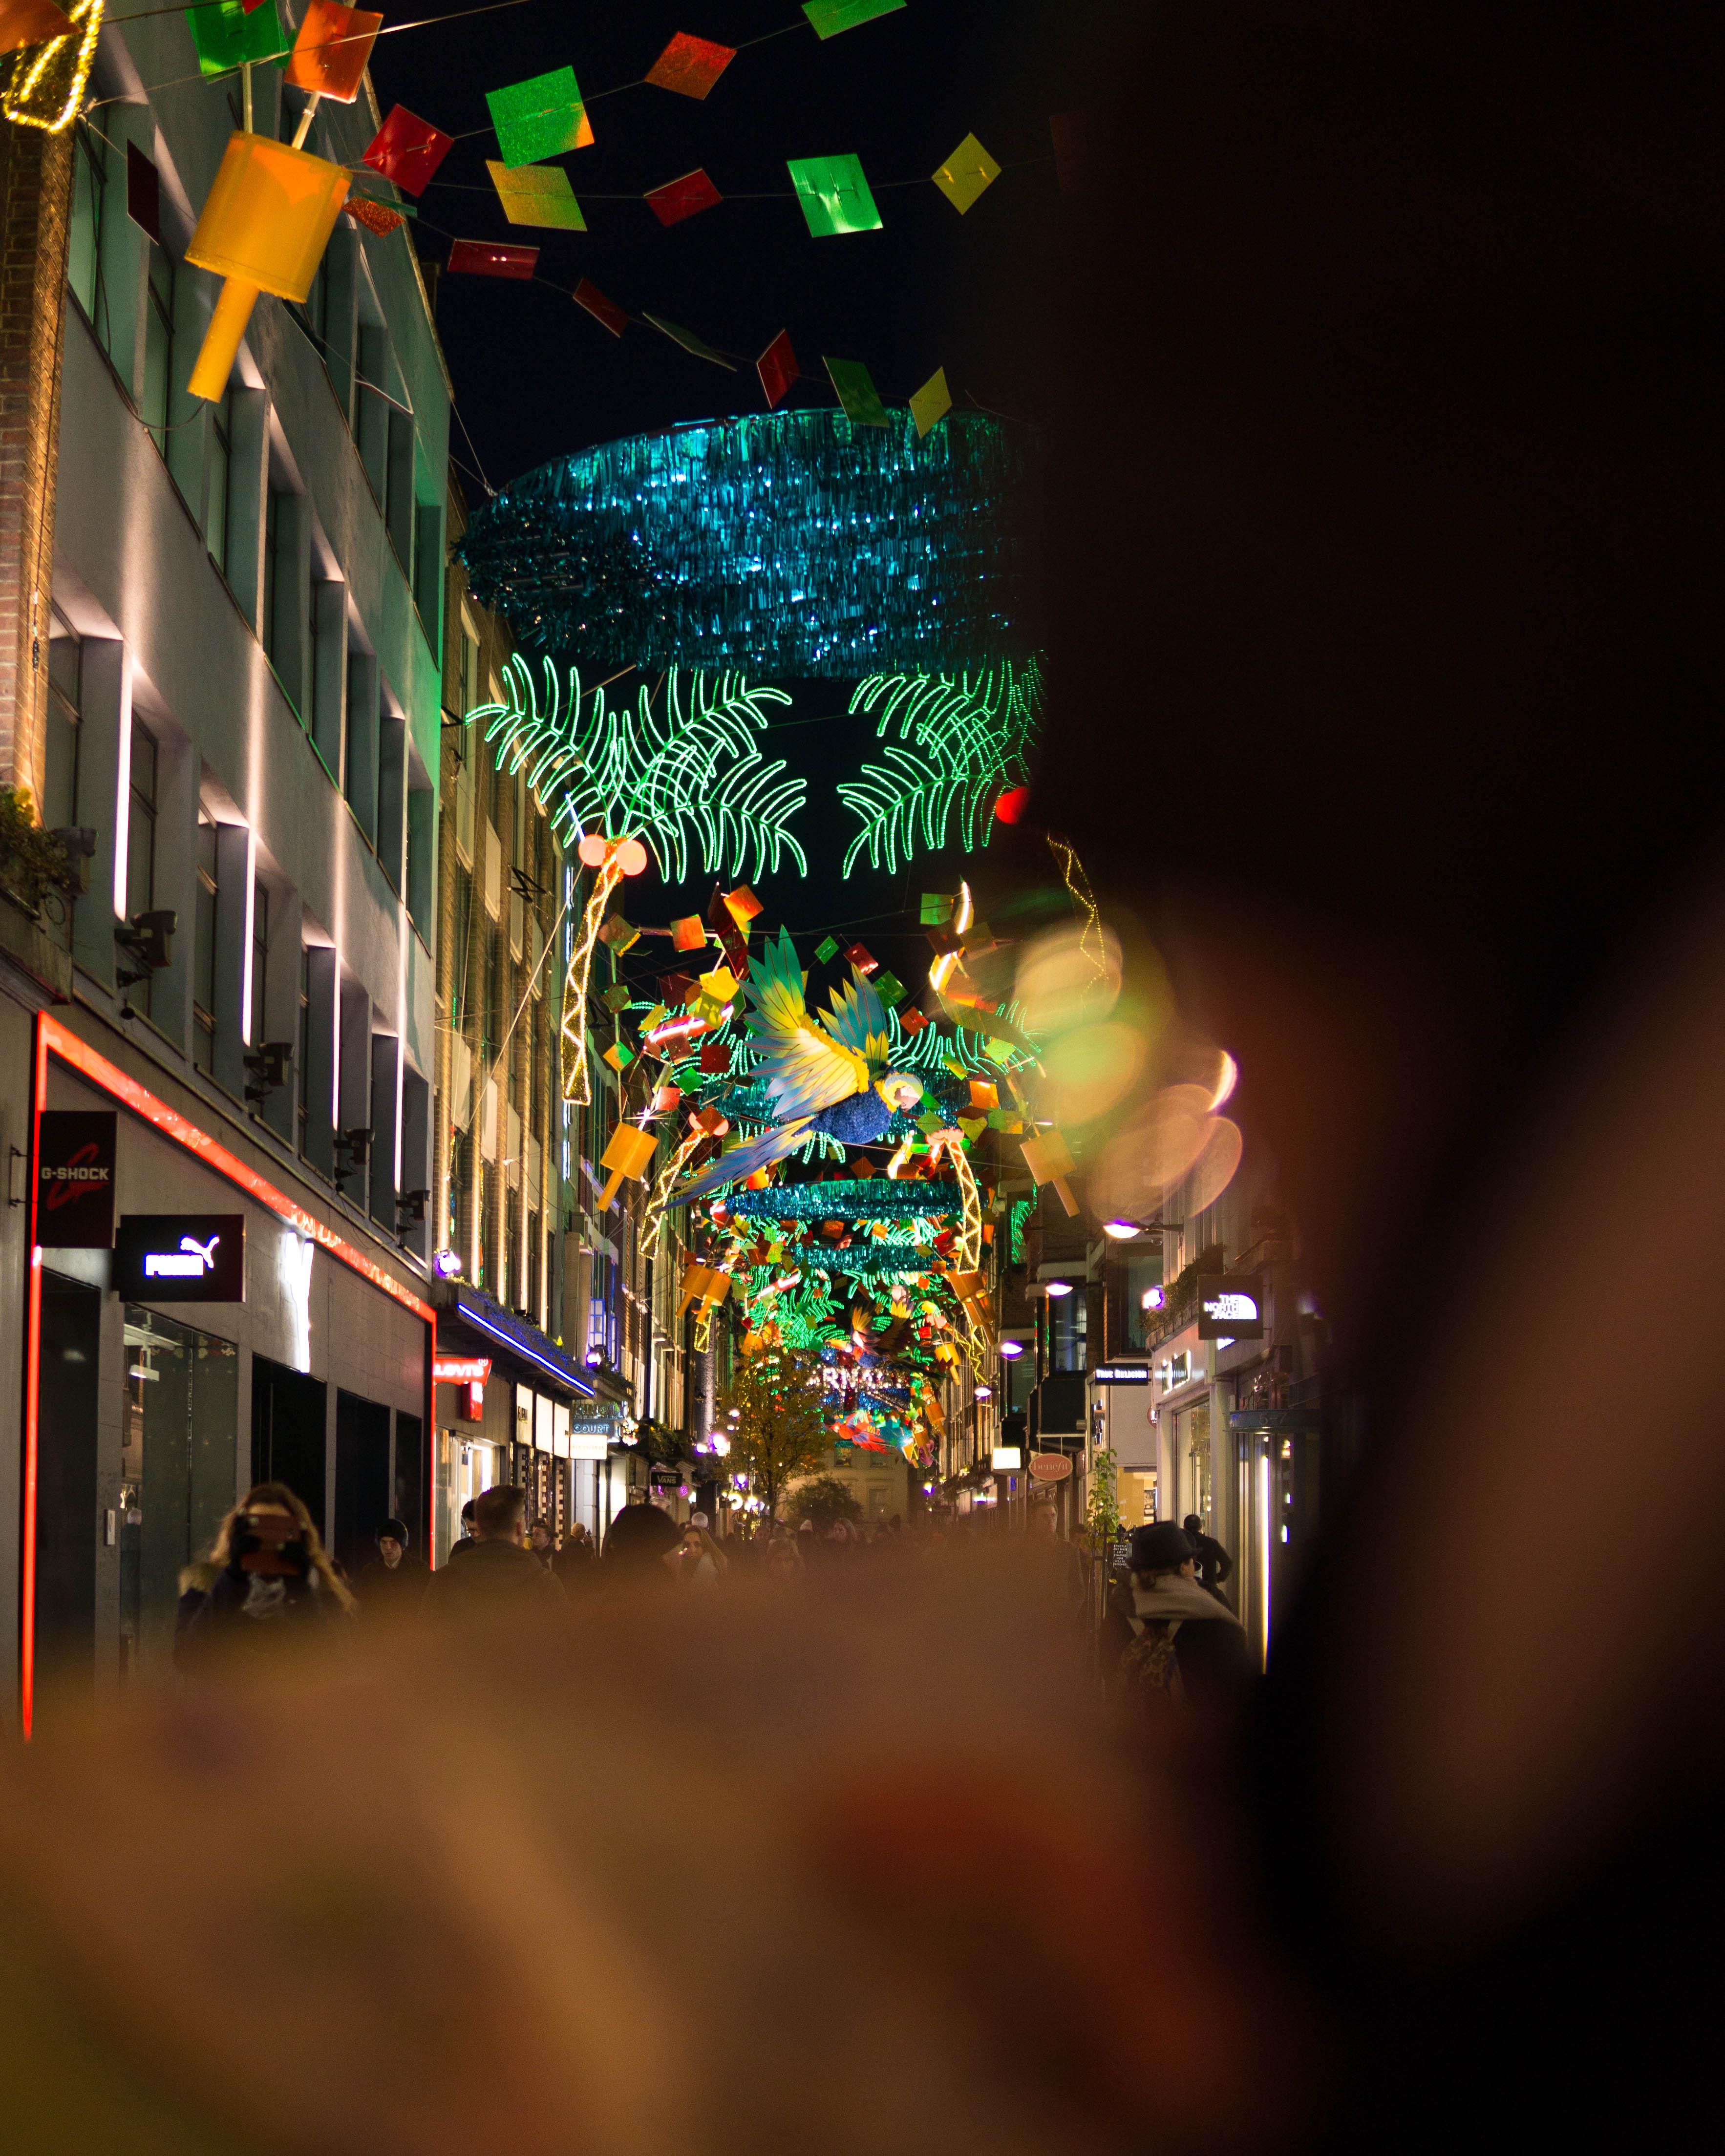 London Christmas Lights Walk What If We Walked